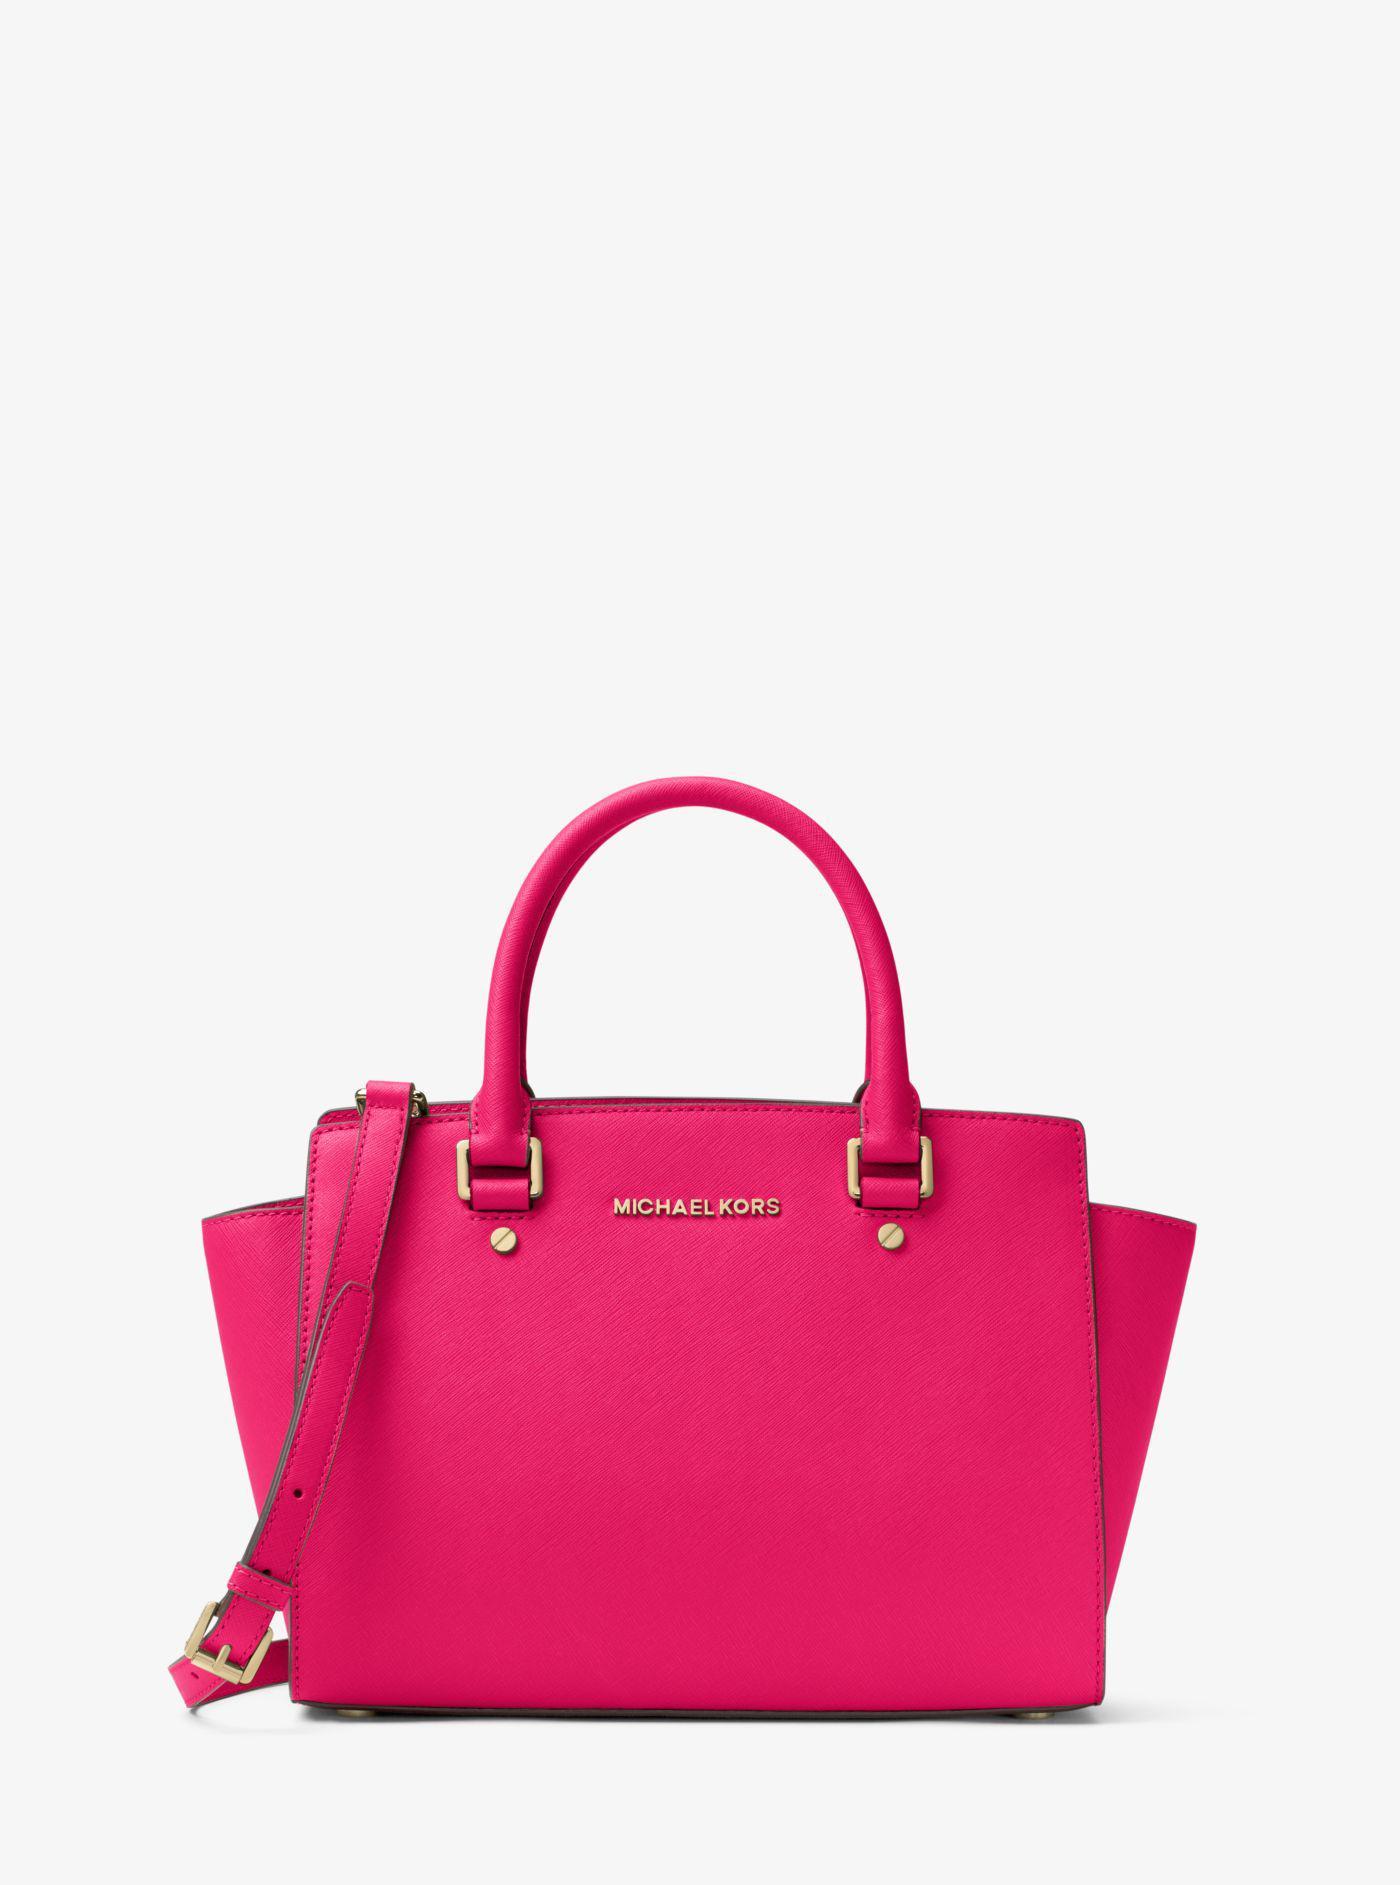 fe663408654c ... cheap michael kors pink selma saffiano leather medium satchel lyst.  view fullscreen ec637 f2ac1